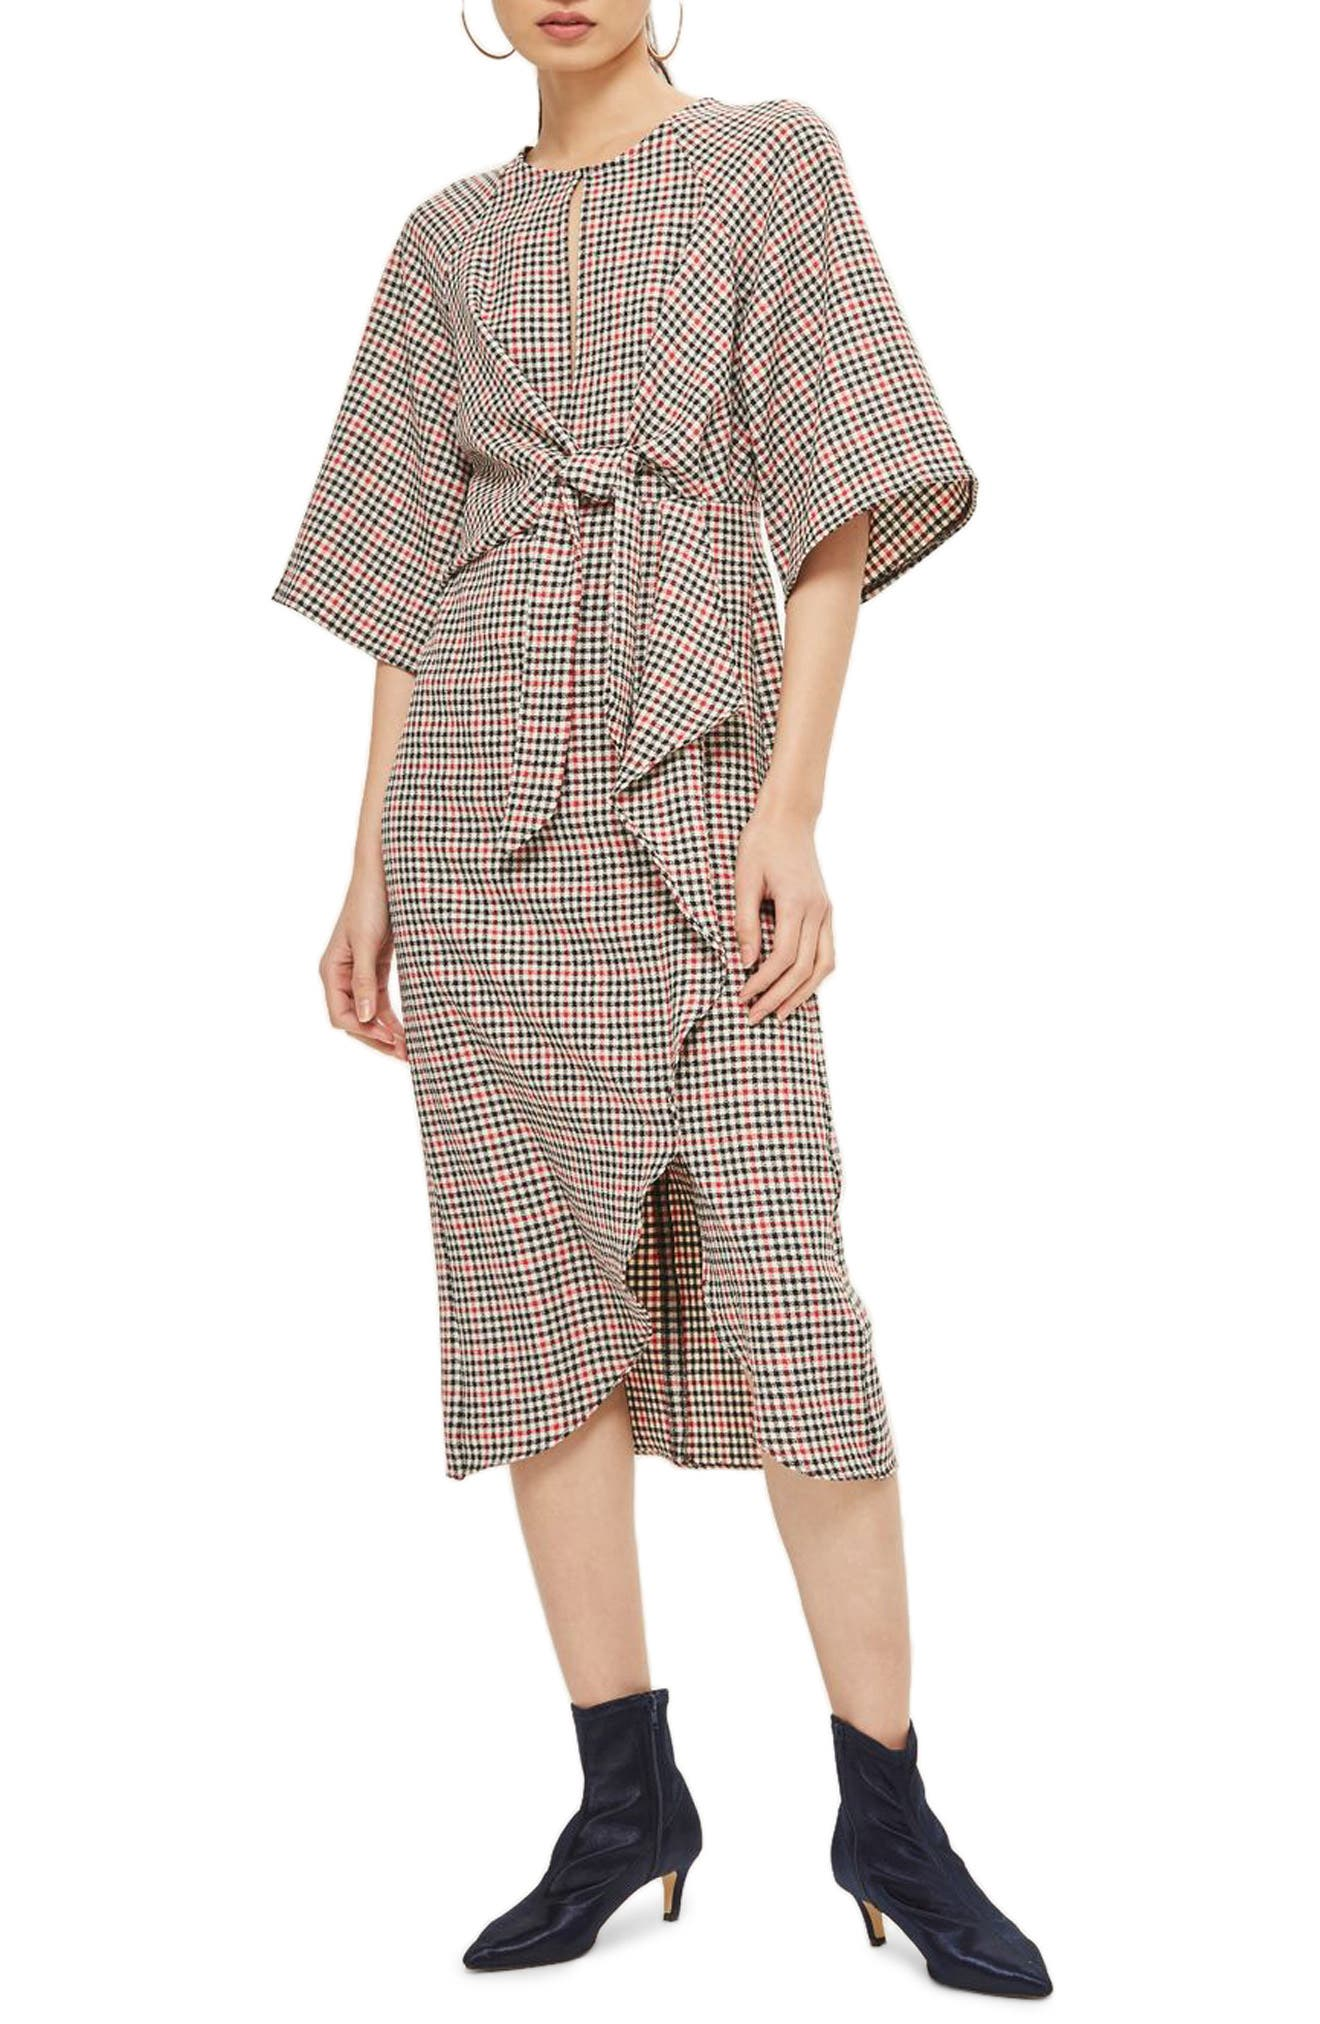 Topshop Plaid Knot Front Midi Dress